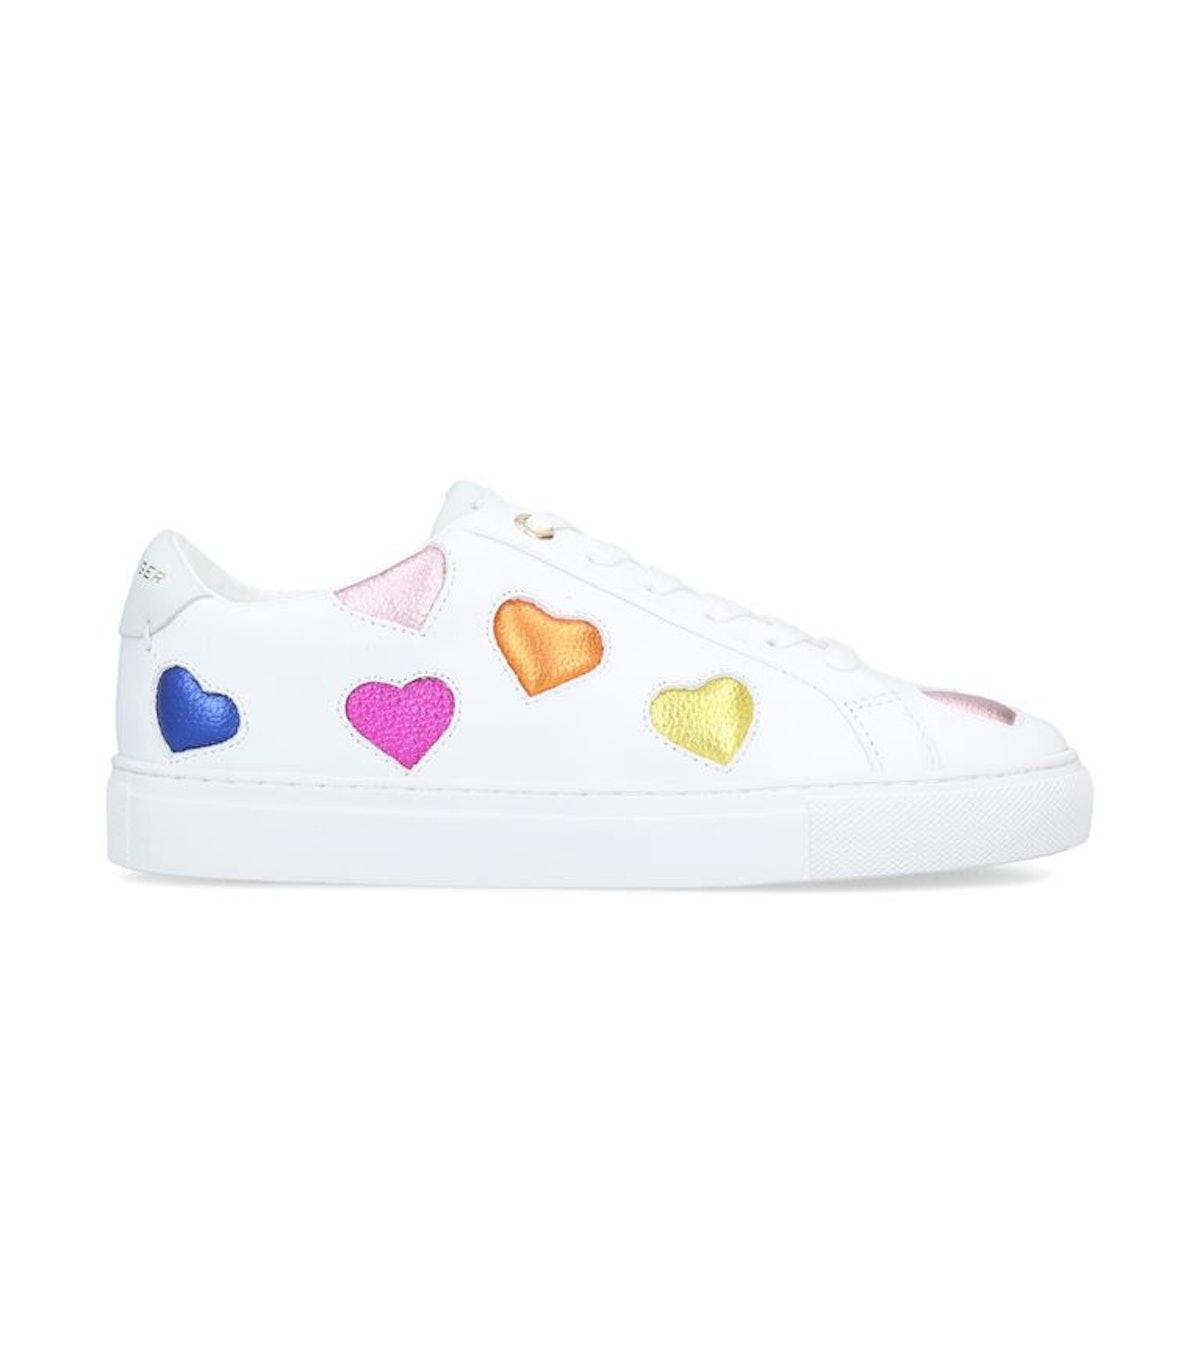 Kurt Geiger London Leather Lane Love Sneakers